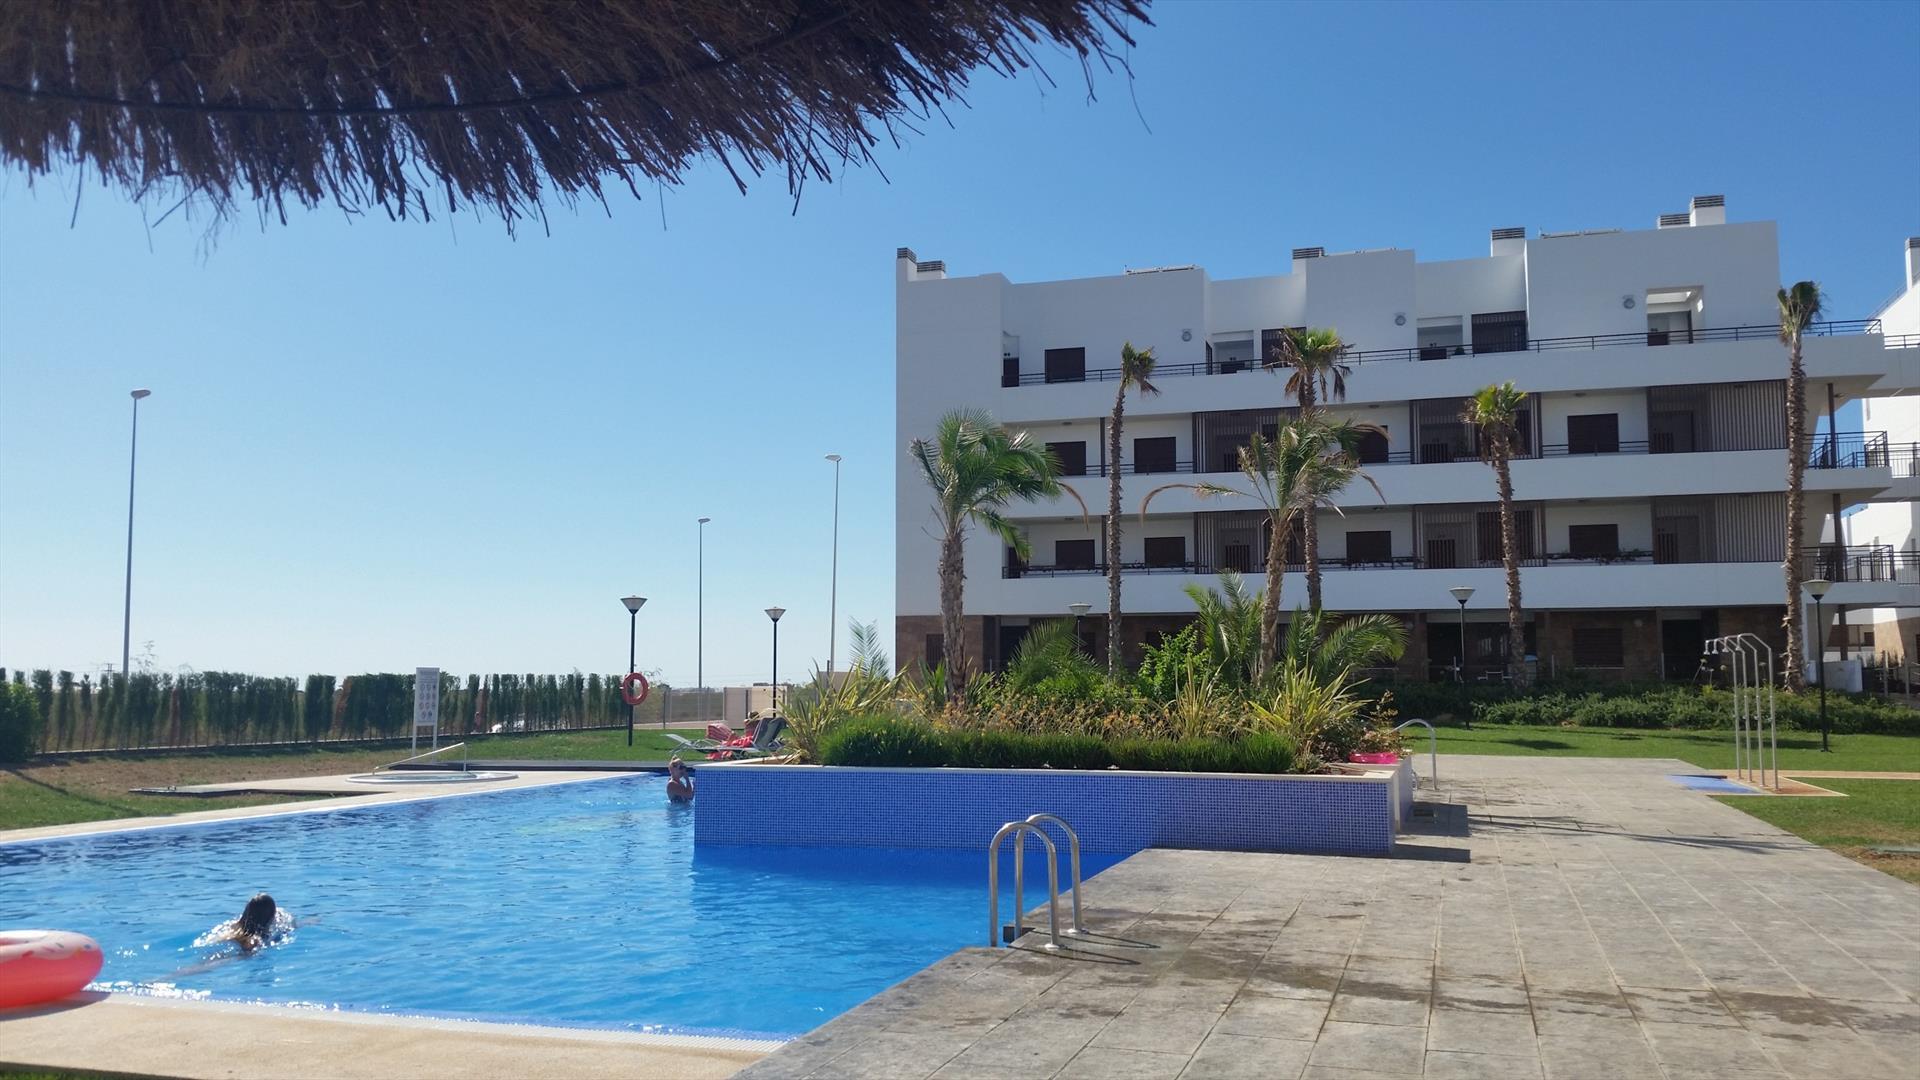 Apartment fresa,Apartamento moderno  con piscina comunitaria en Orihuela Costa, en la Costa Blanca, España para 4 personas...